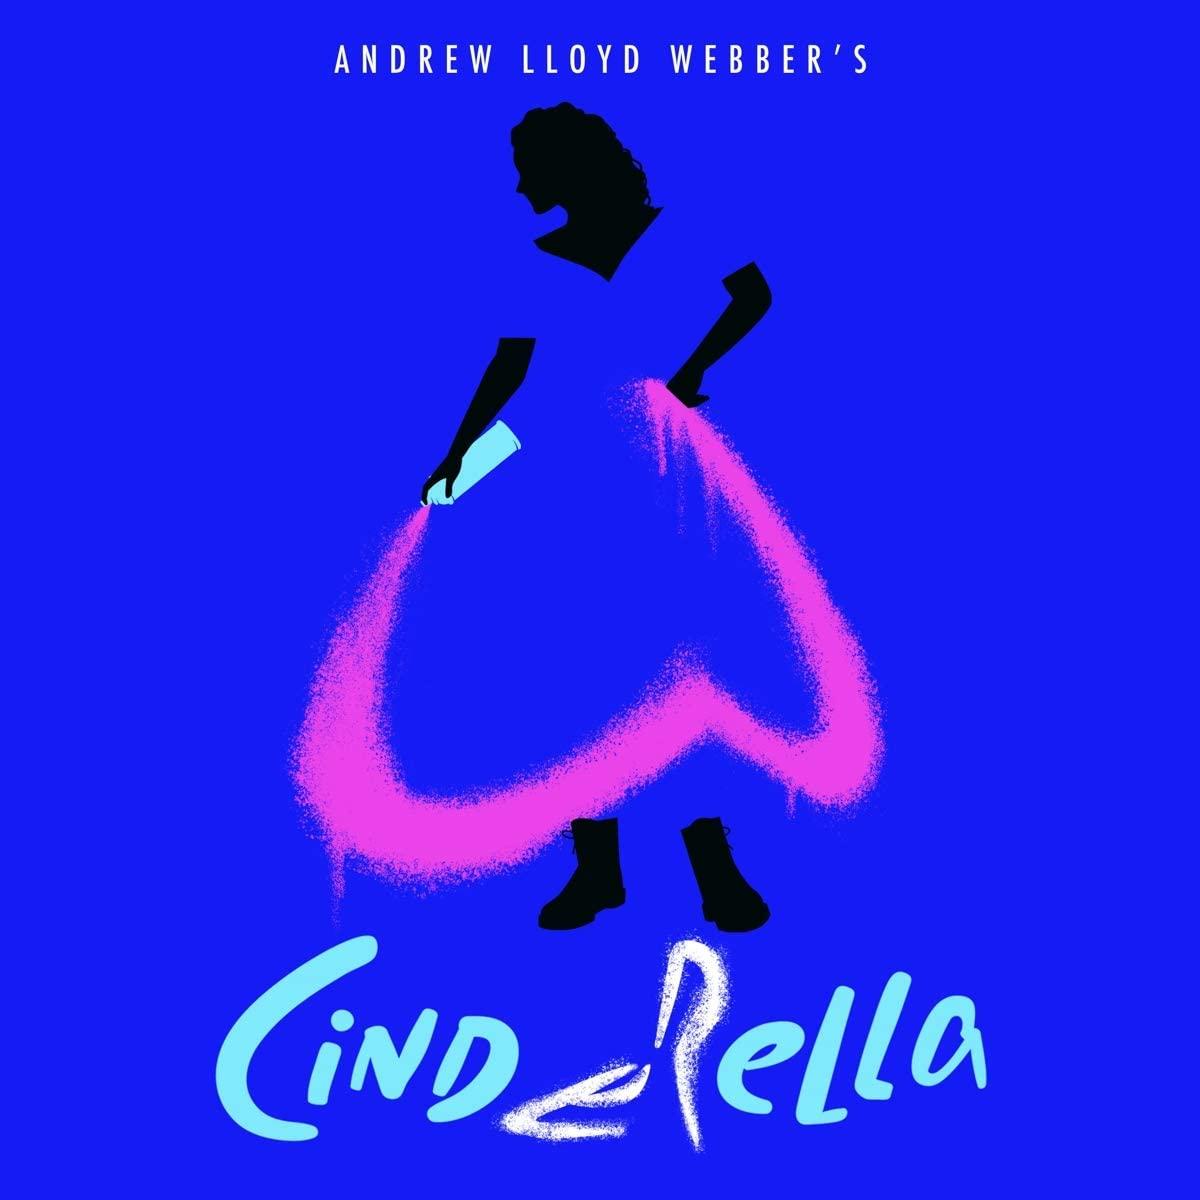 Andrew Lloyd Webber's Cinderella  - Andrew Lloyd Webber